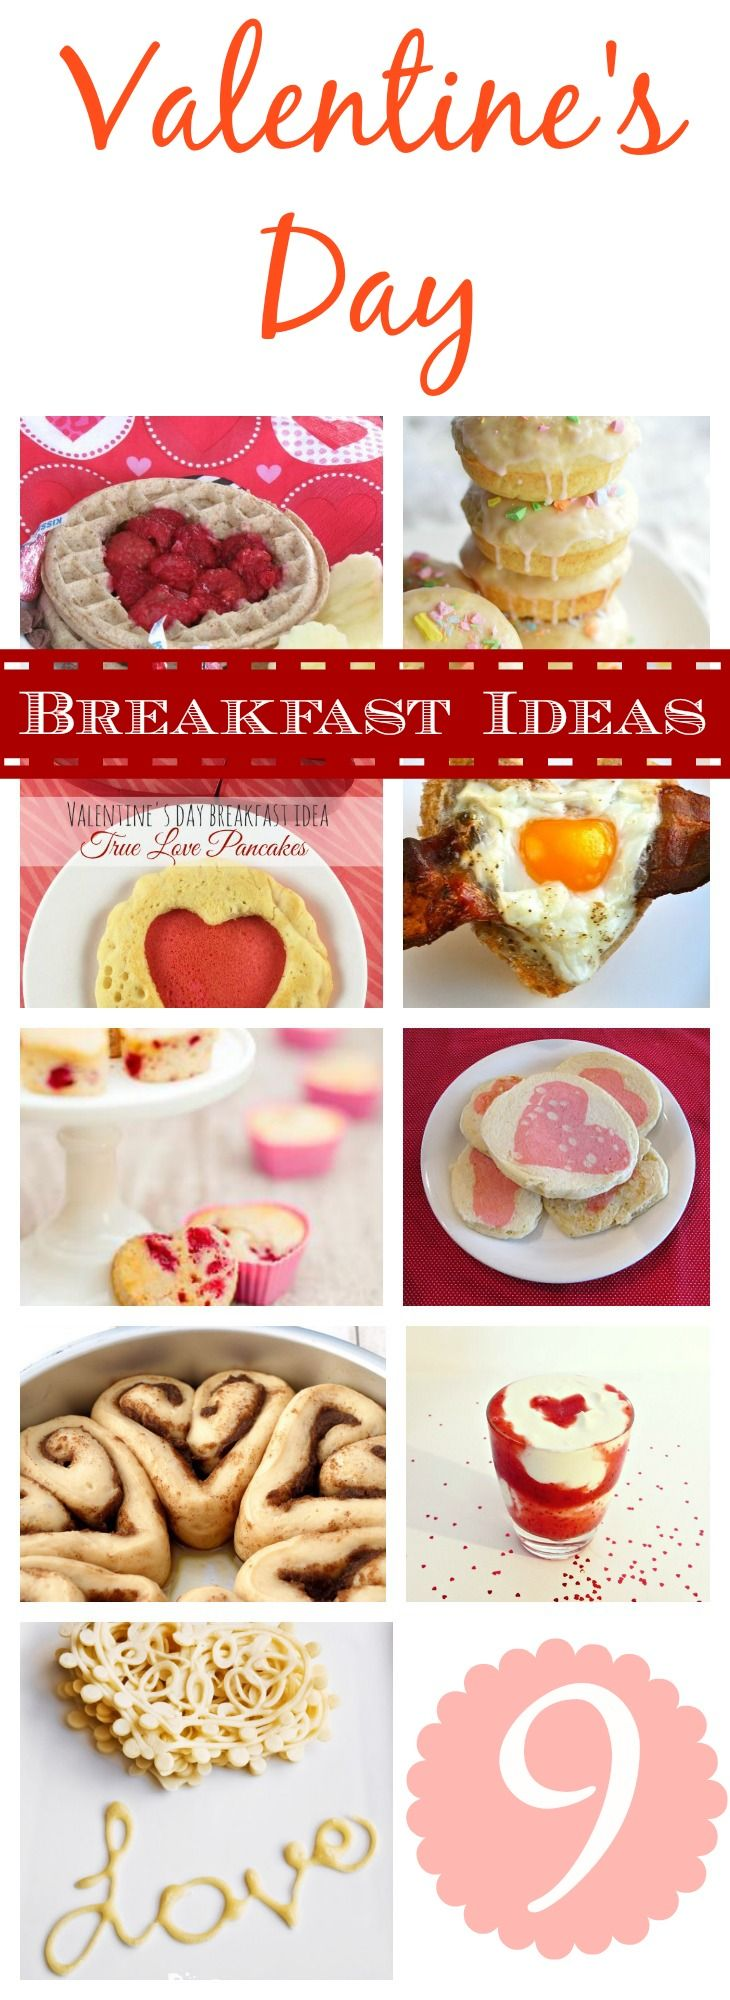 #ValentinesDay #Breakfast Ideas. #food #SharingGoodFood #celebrateValentine'S Day, Cinnamon Buns, Valentine Day, Cinnamon Rolls, Romantic Breakfast Ideas, Breakfast In Bed, Curvyk Valentineswishlist, Ideas Valentinesday, Breakfast Recipes